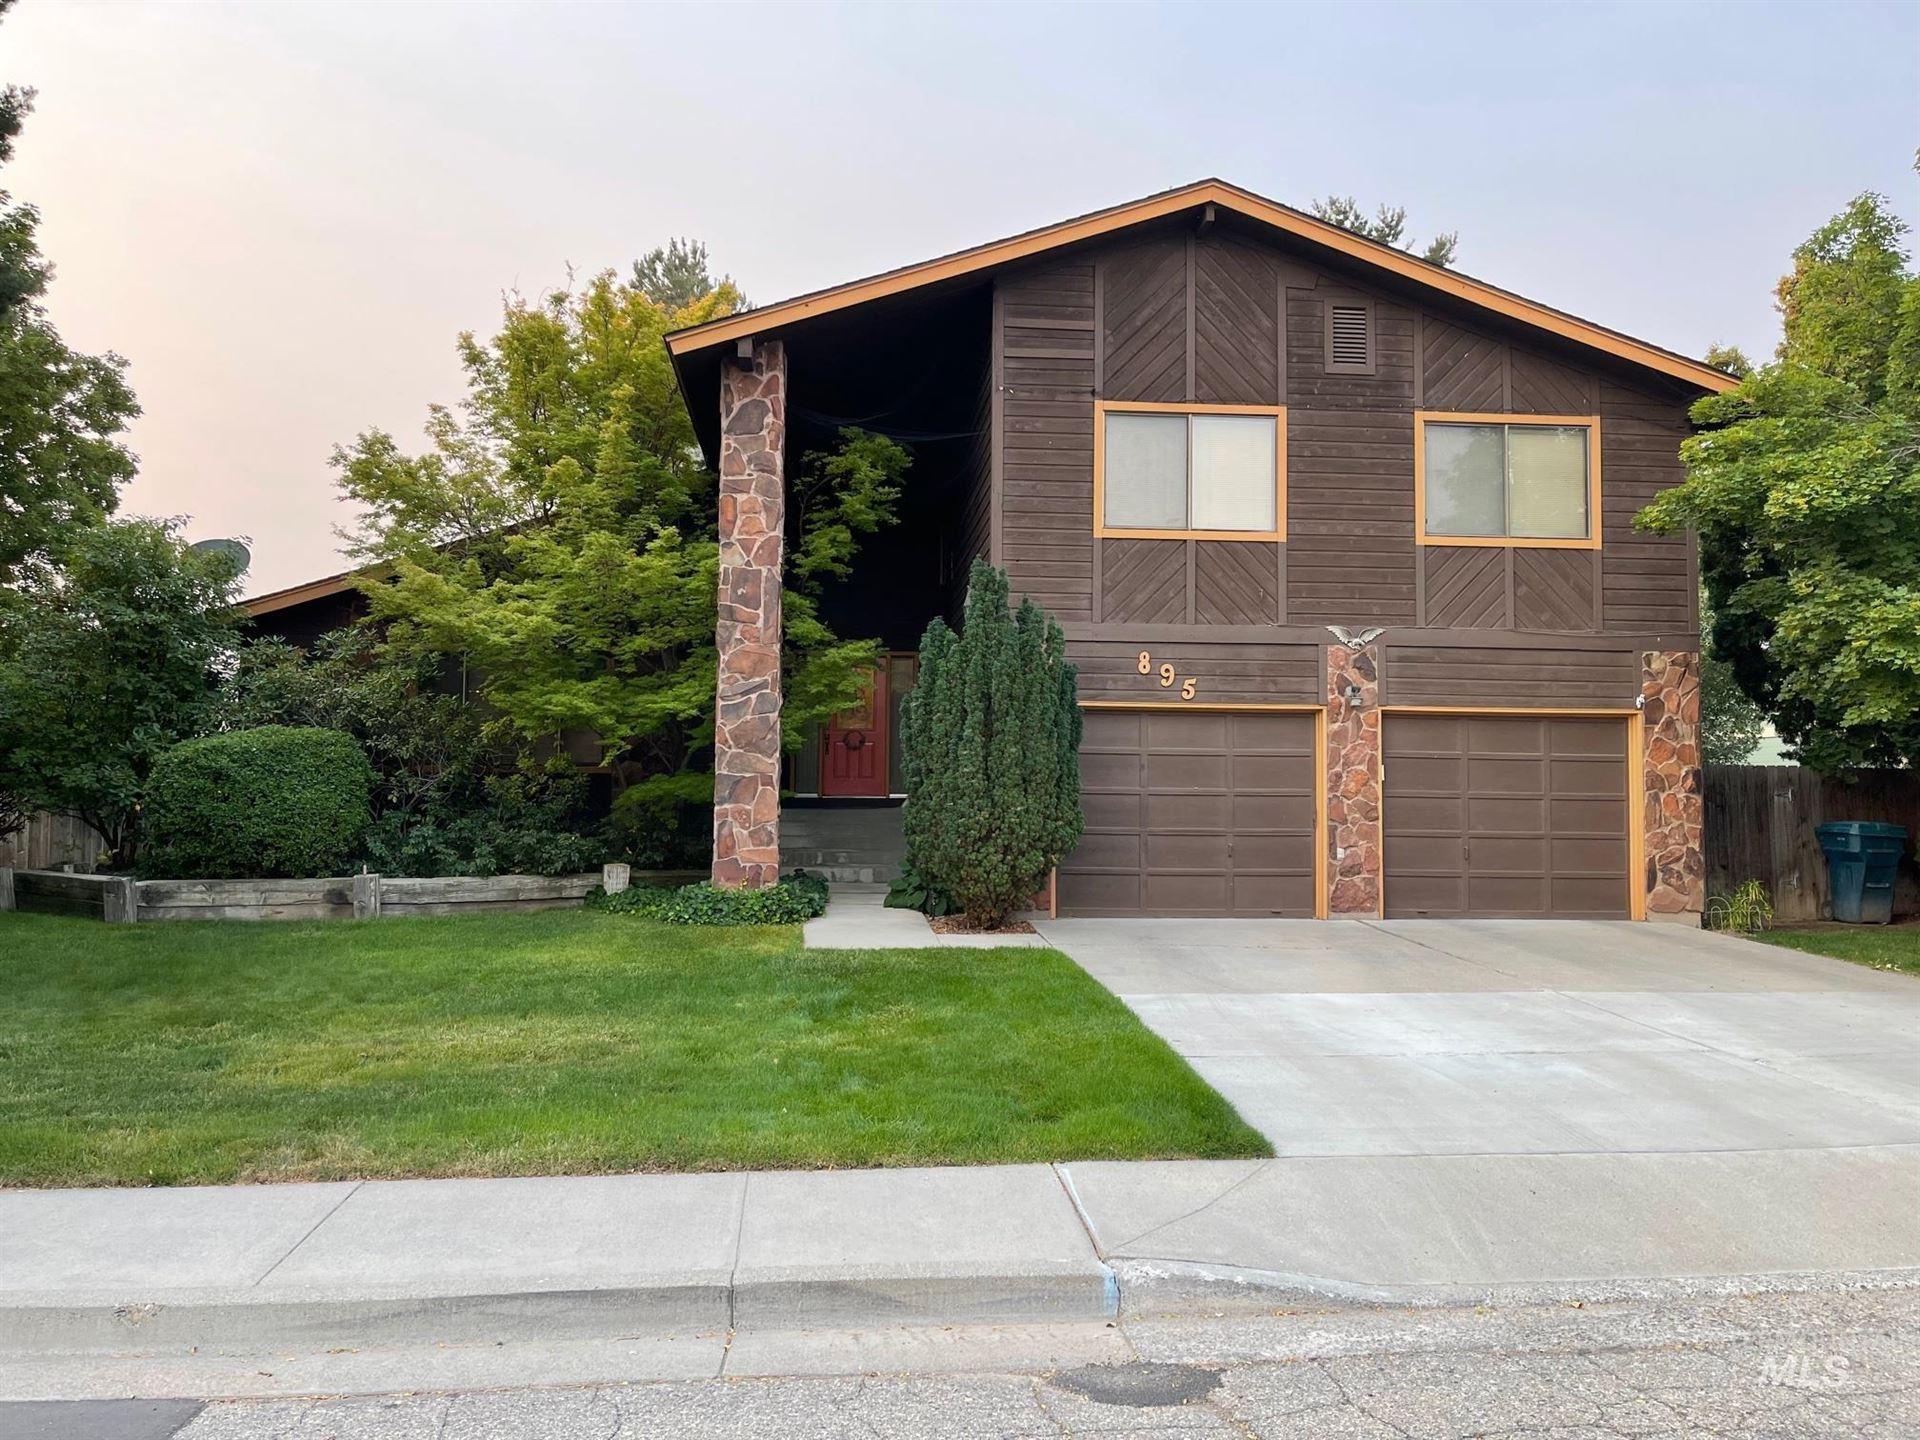 895 E 14th N, Mountain Home, ID 83647 - MLS#: 98818254